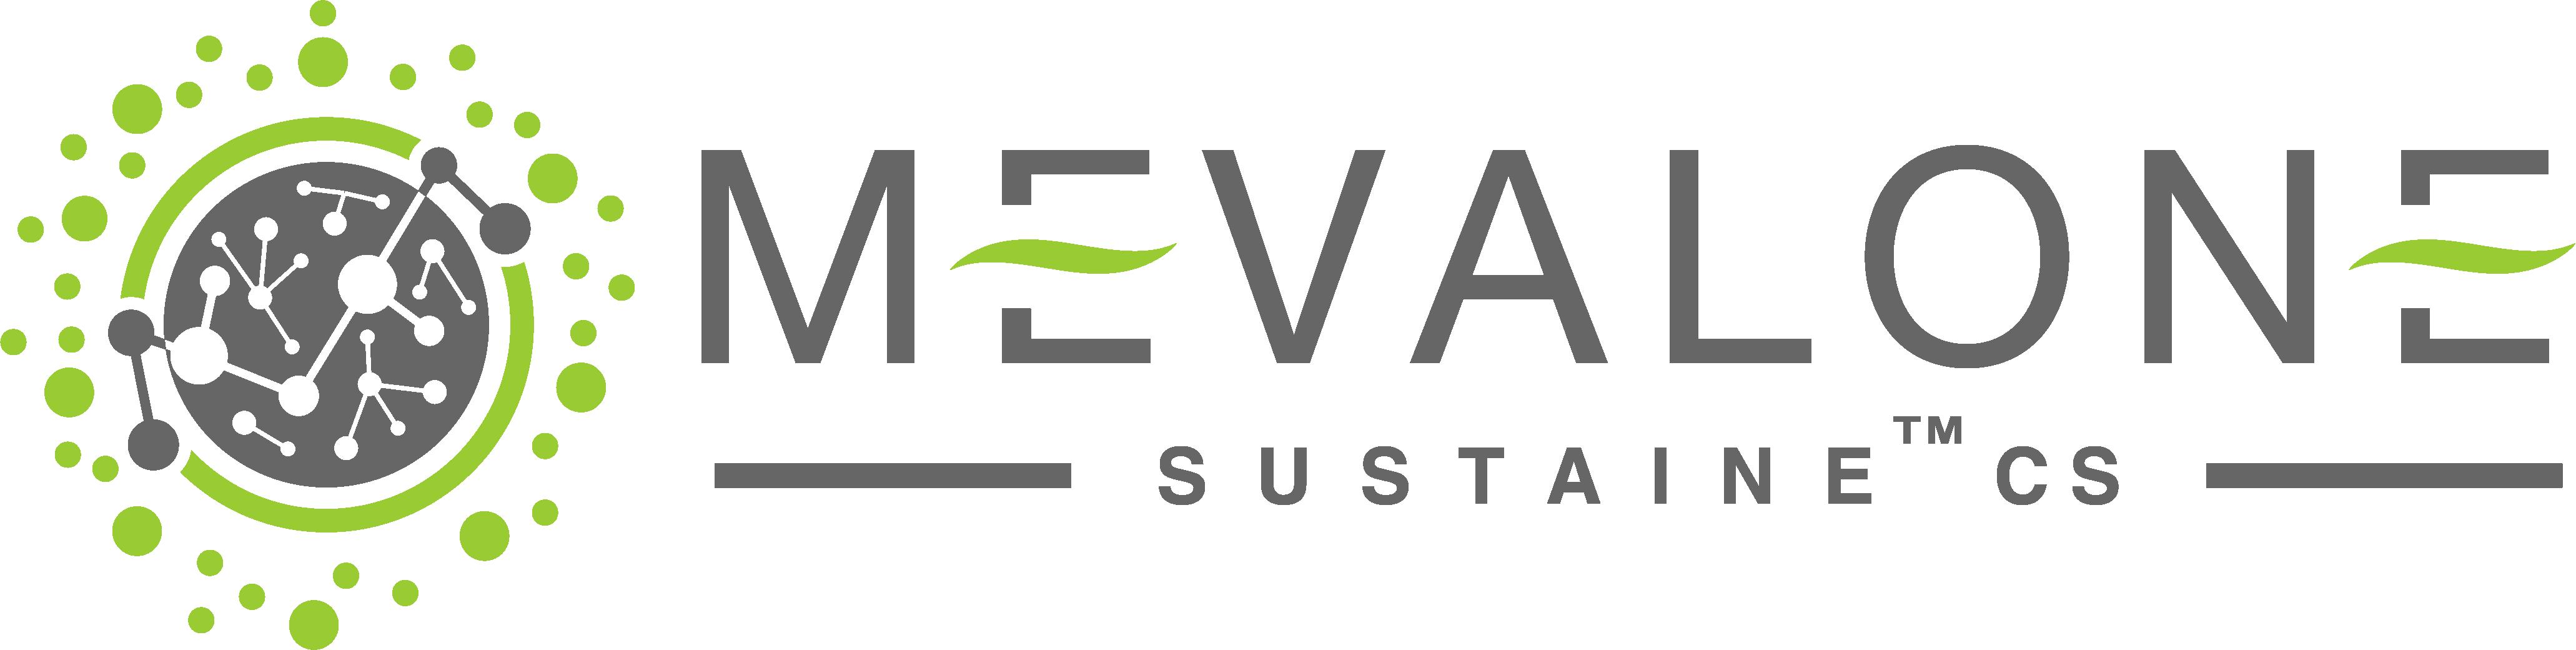 Mevalone logo